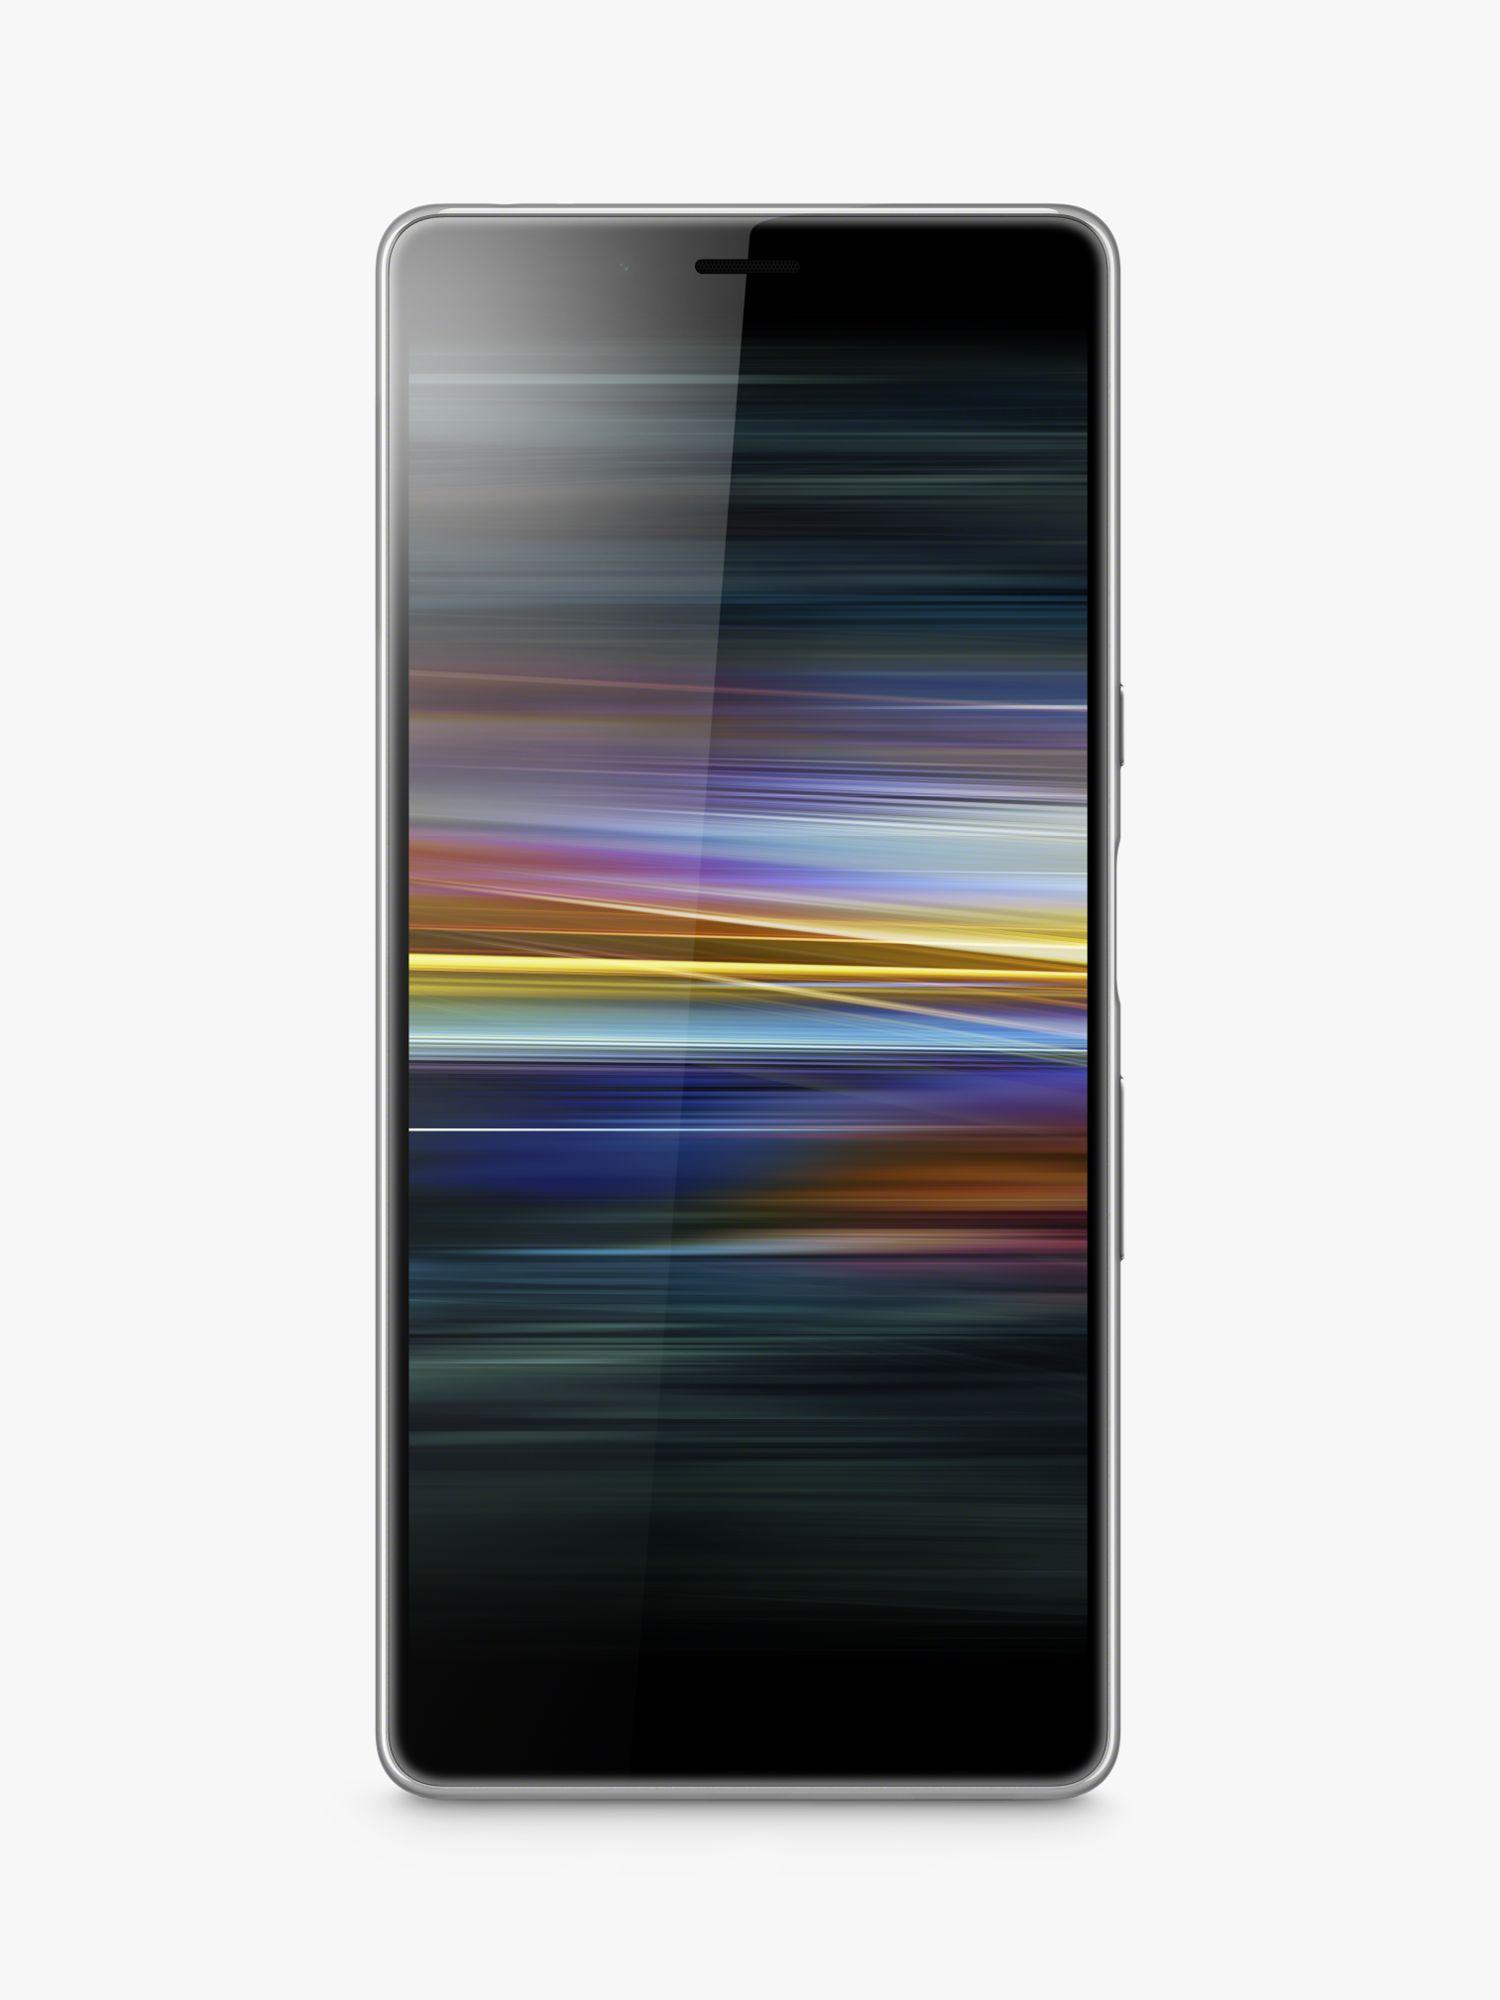 "Sony Sony Xperia L3 Smartphone, Android, 5.7"", 4G LTE, SIM Free, 3GB RAM, 32GB"